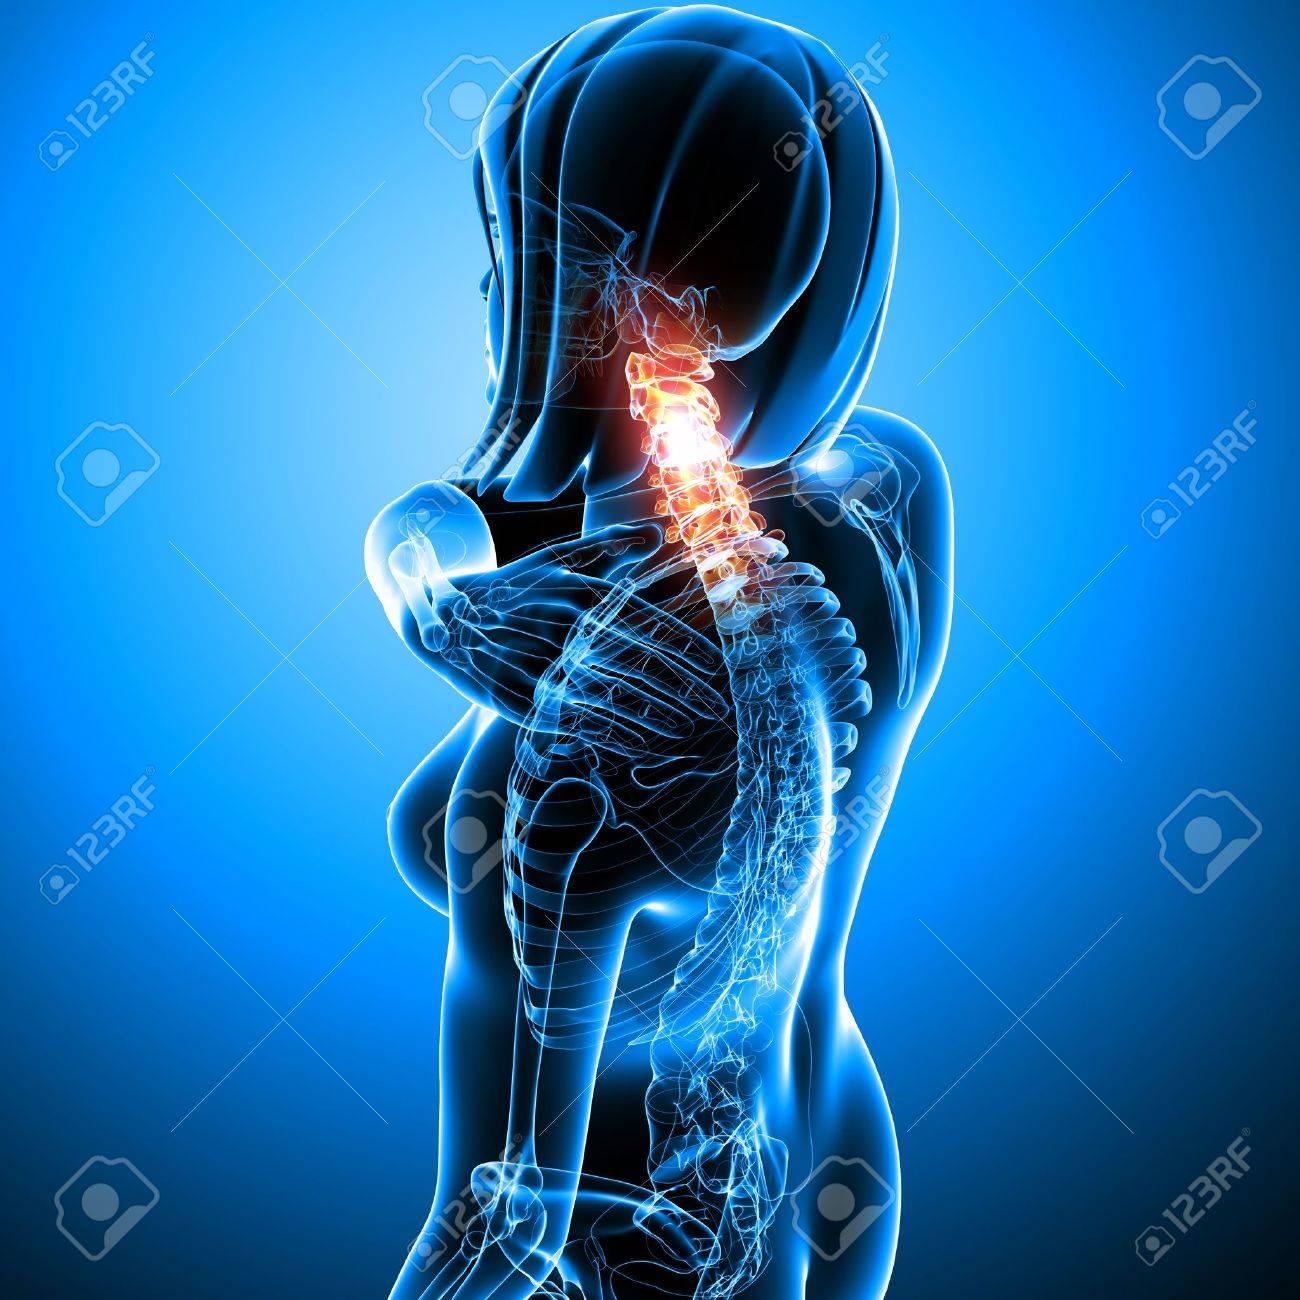 Anatomy of female acneck pain Stock Photo - 13757917